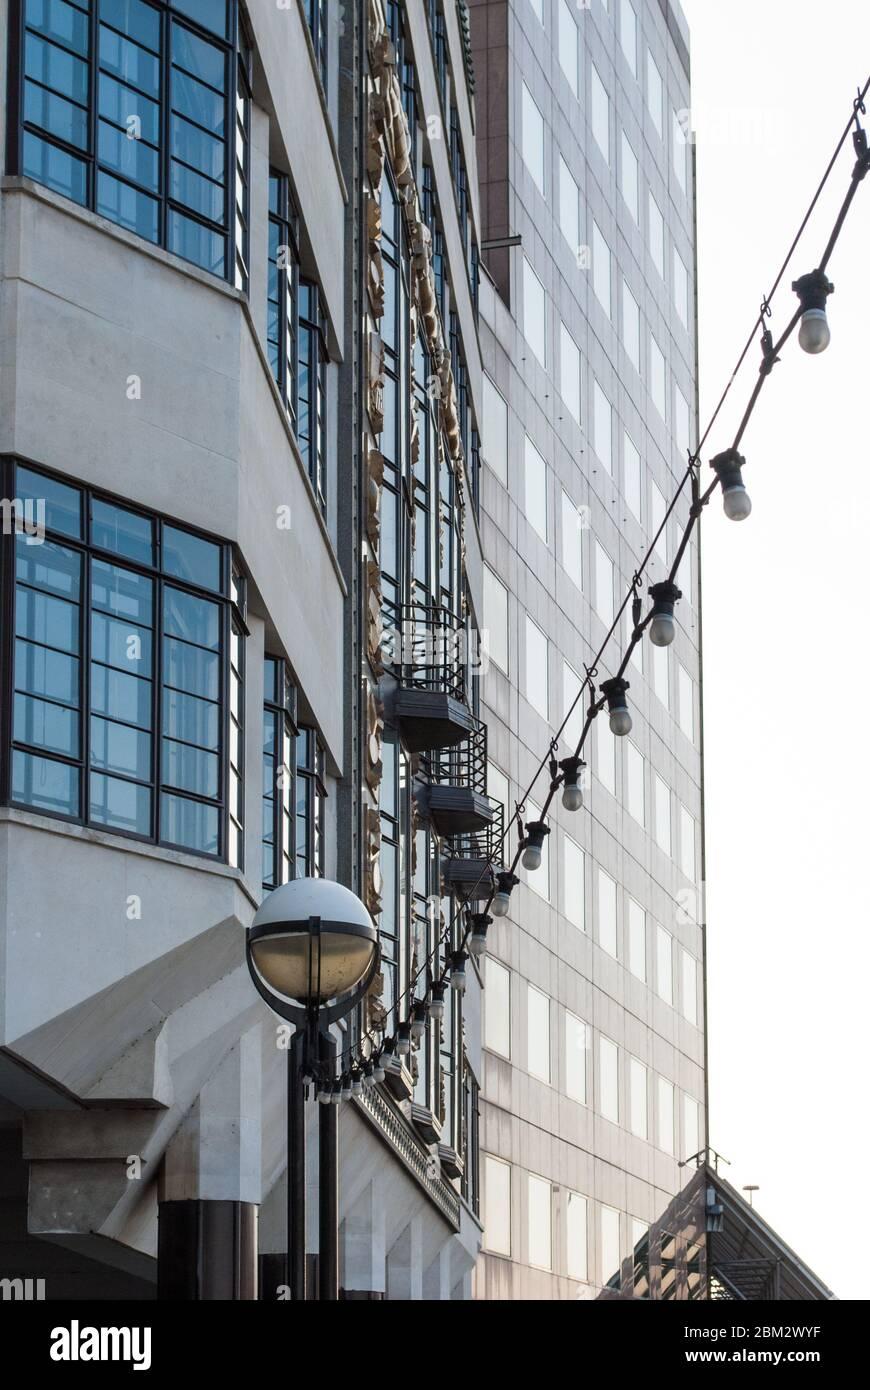 Modern Art Deco Hay's Wharf St. Olaf House, 27 Tooley Street, London SE1 2PR Riverside Architectural Detail by Harry Stuart Goodhart-Rendel Stock Photo